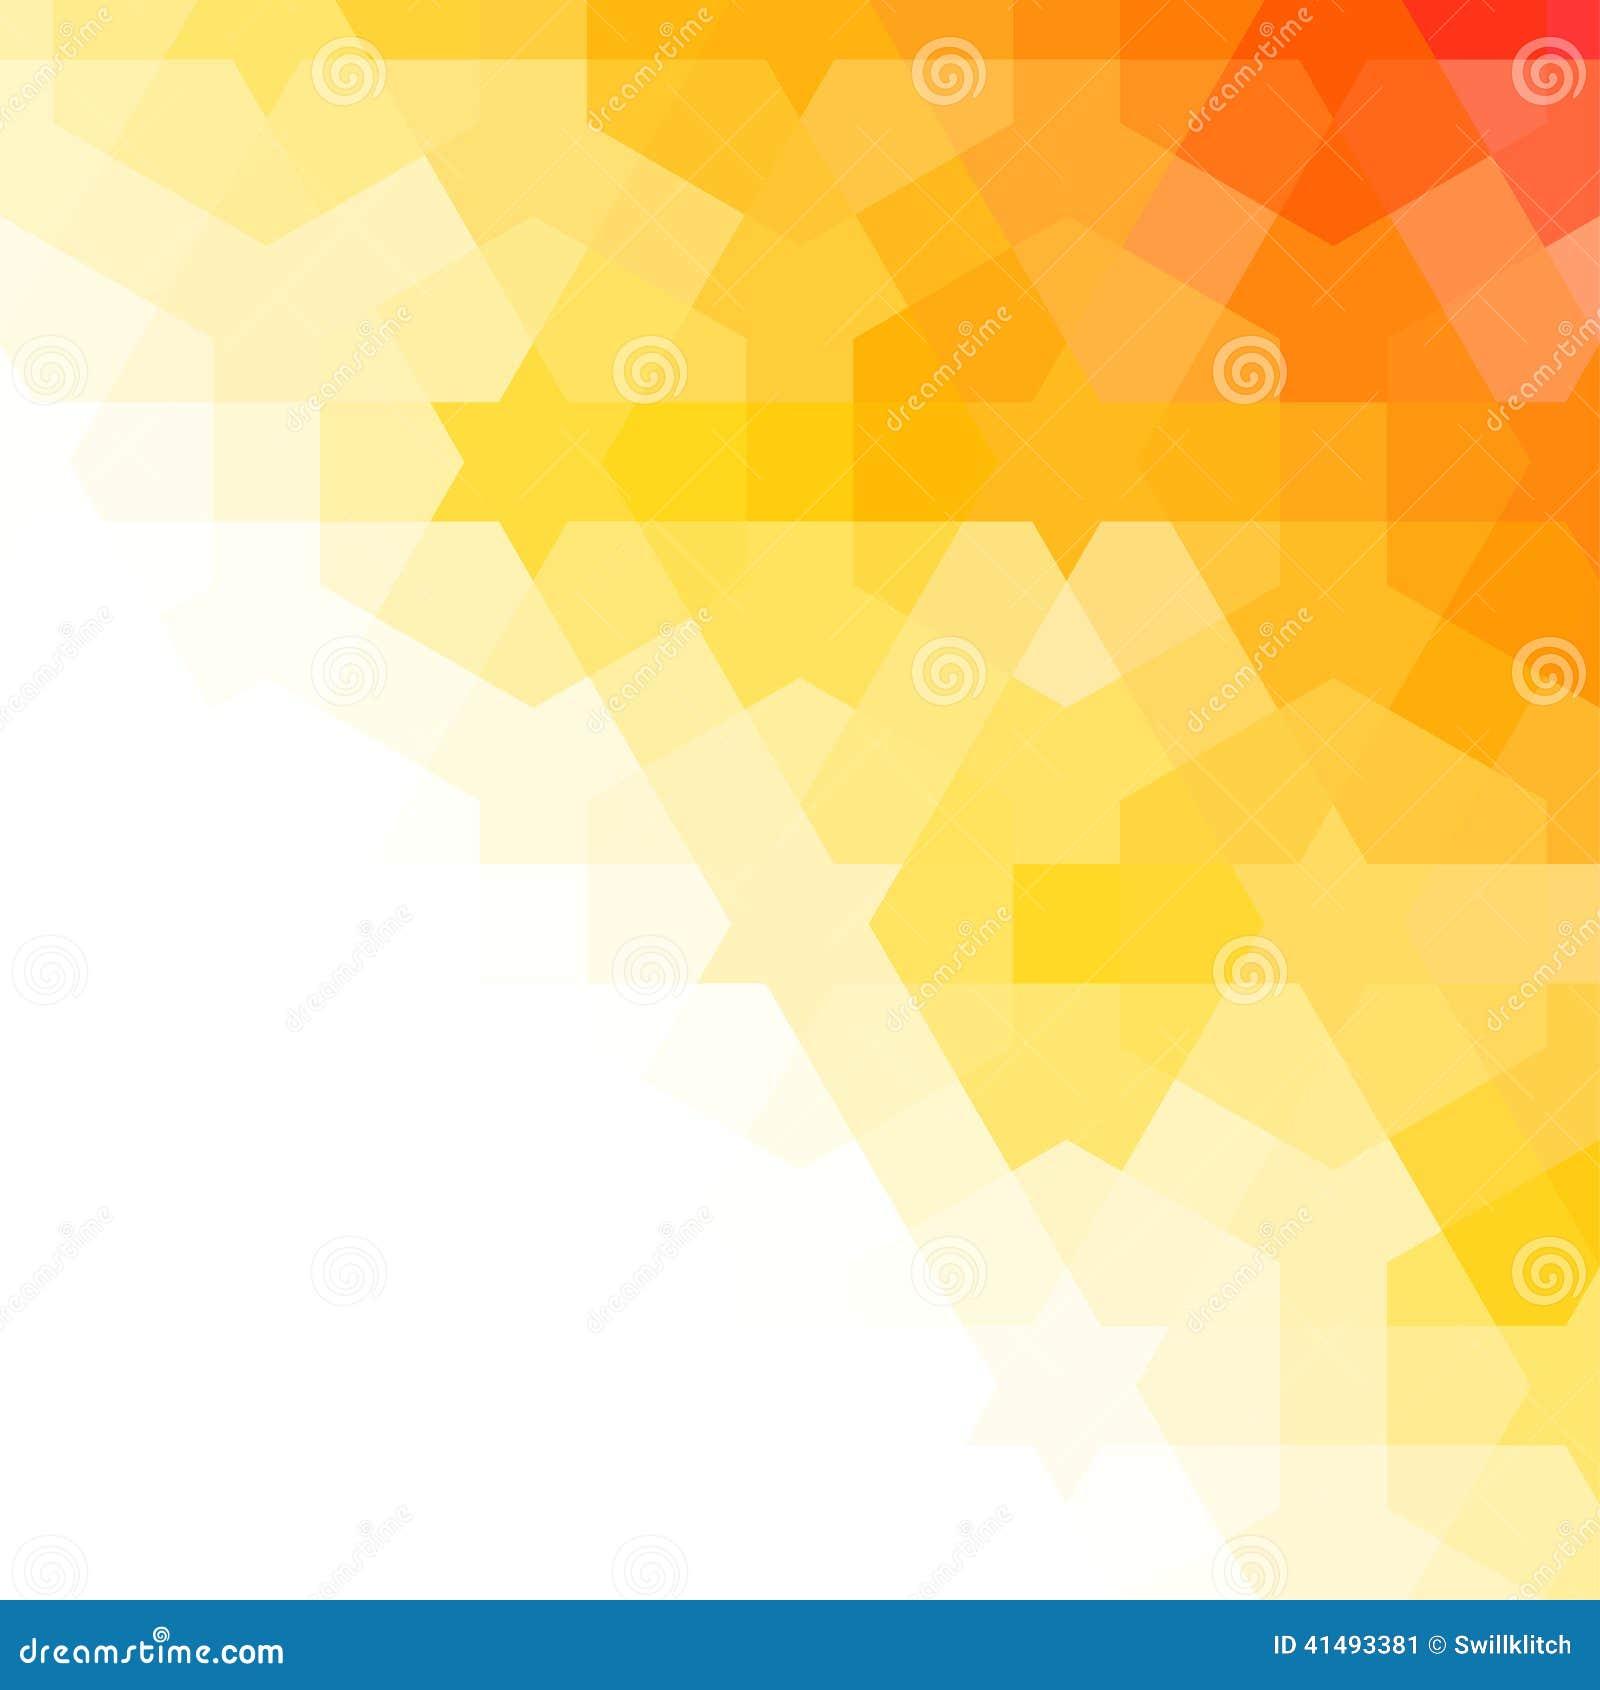 Orange And White Arabic Background Stock Vector